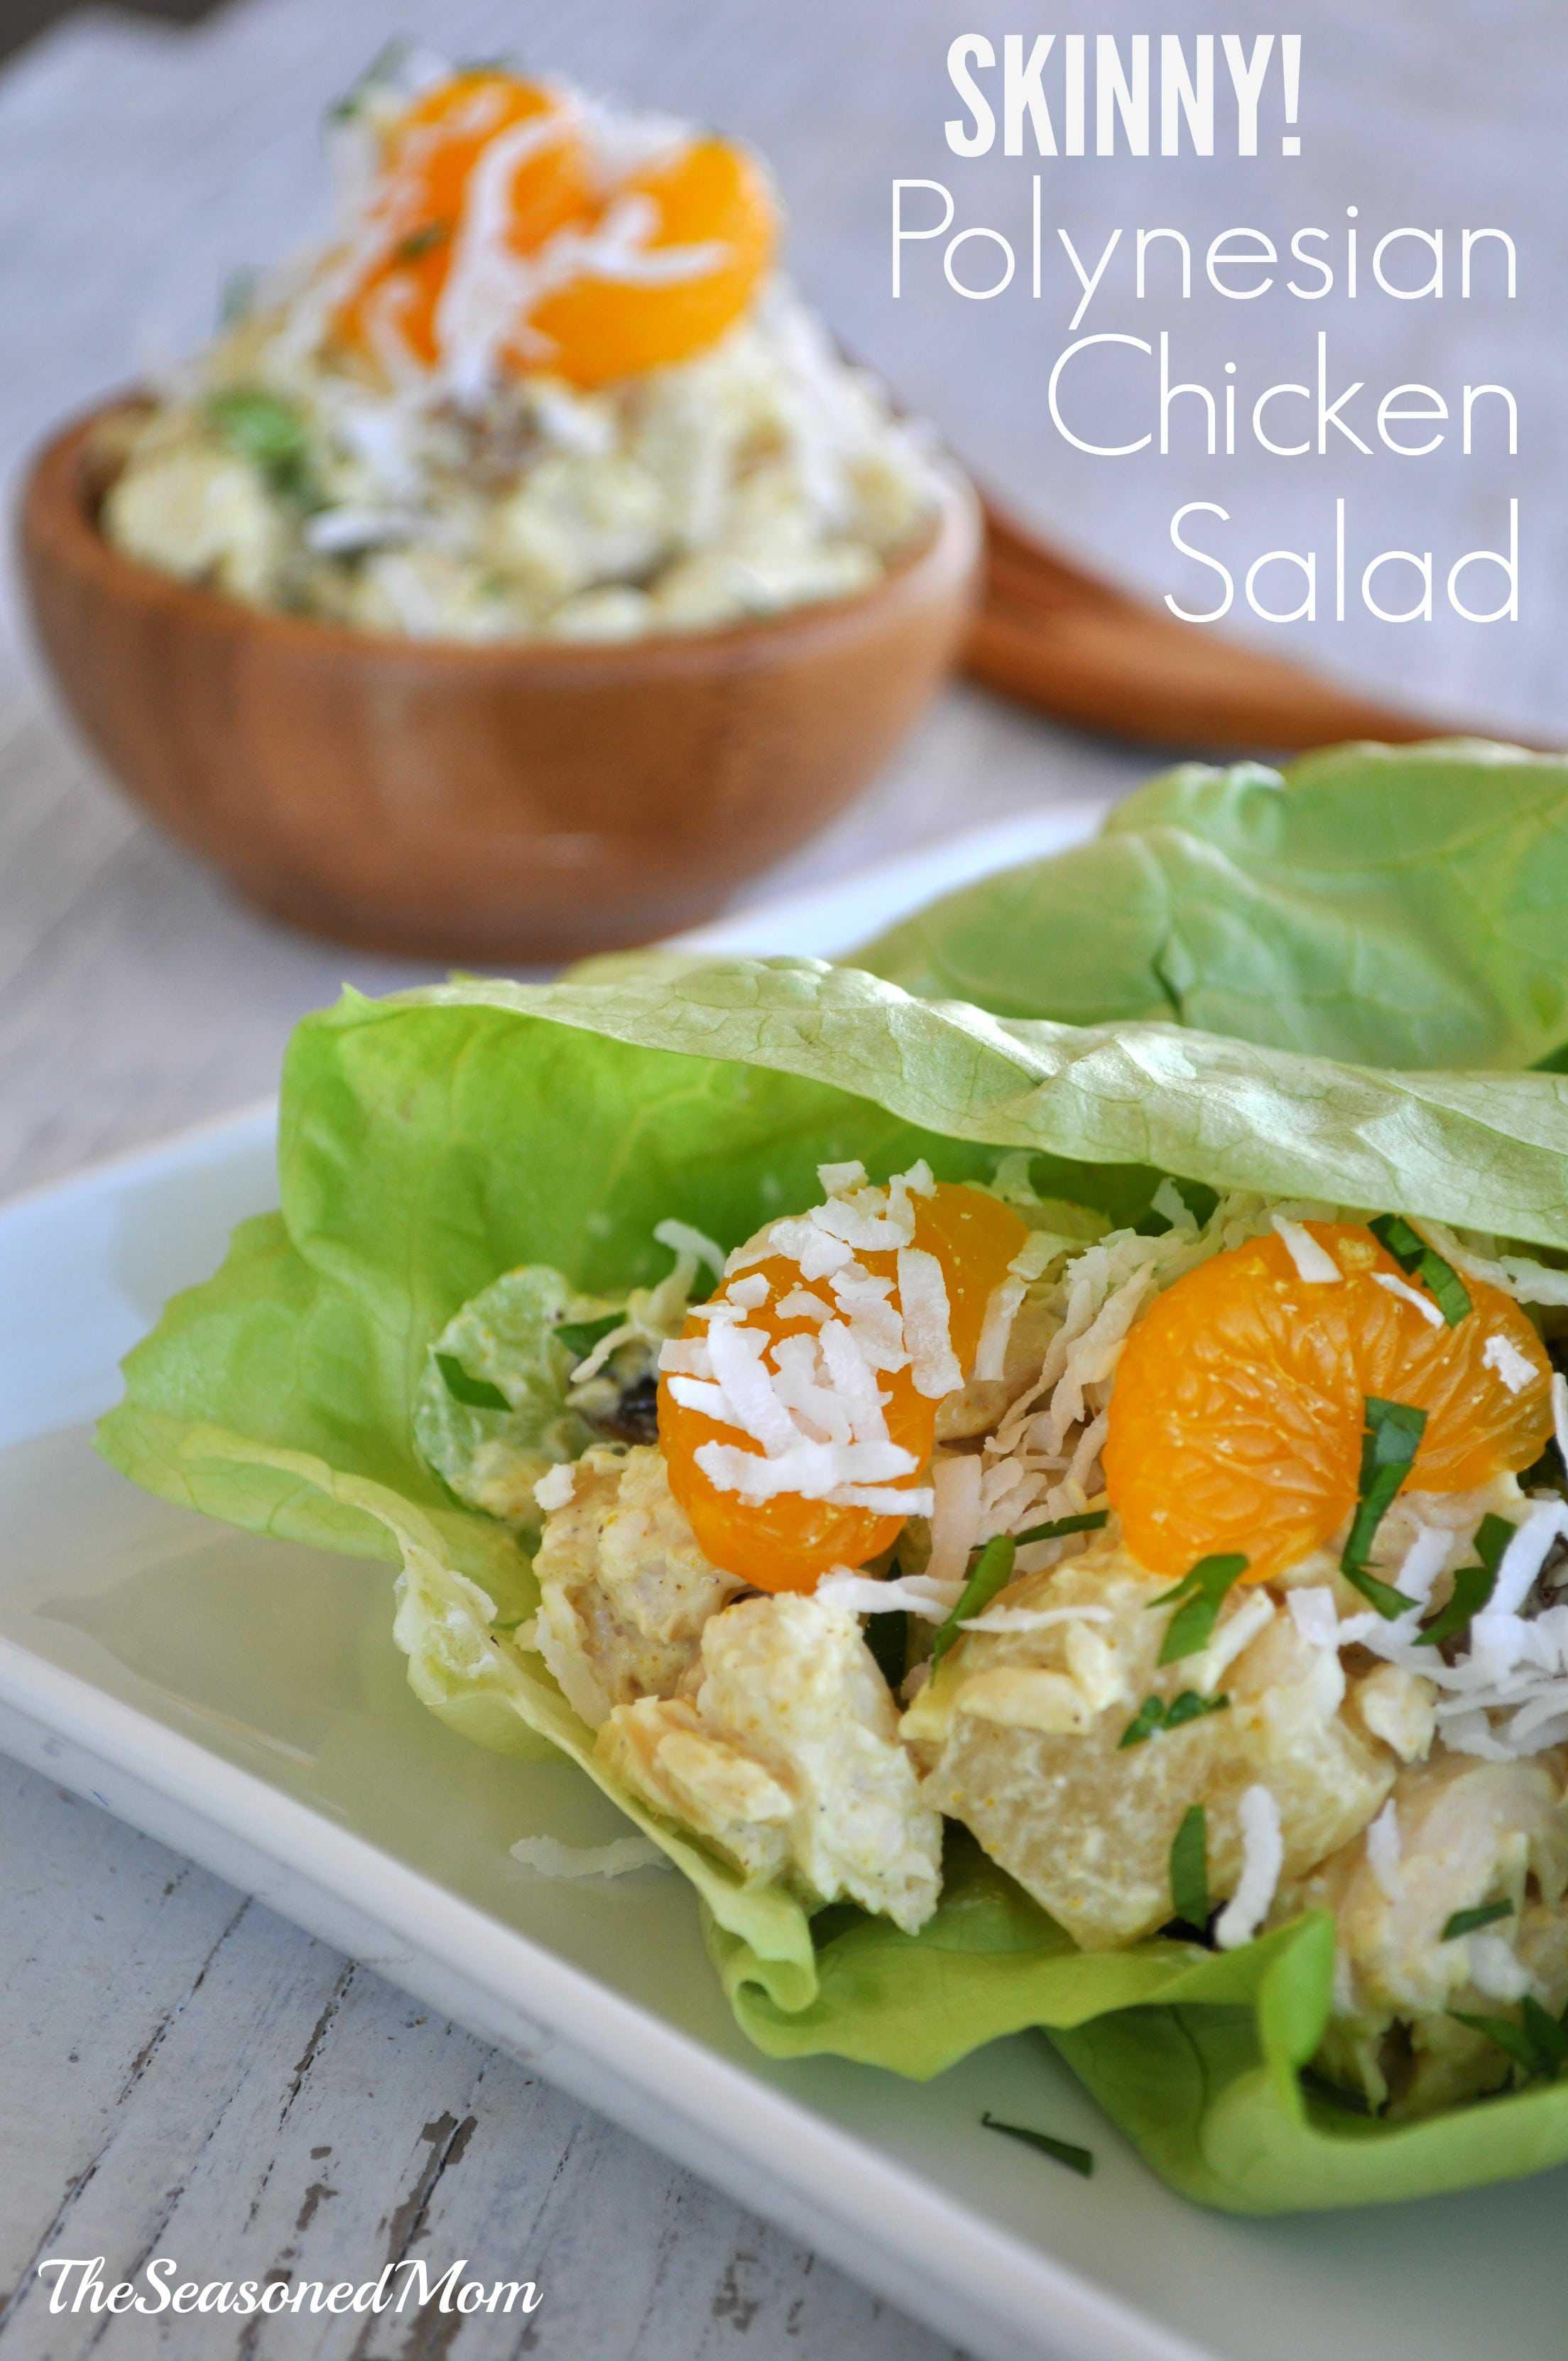 Skinny Polynesian Chicken Salad - The Seasoned Mom